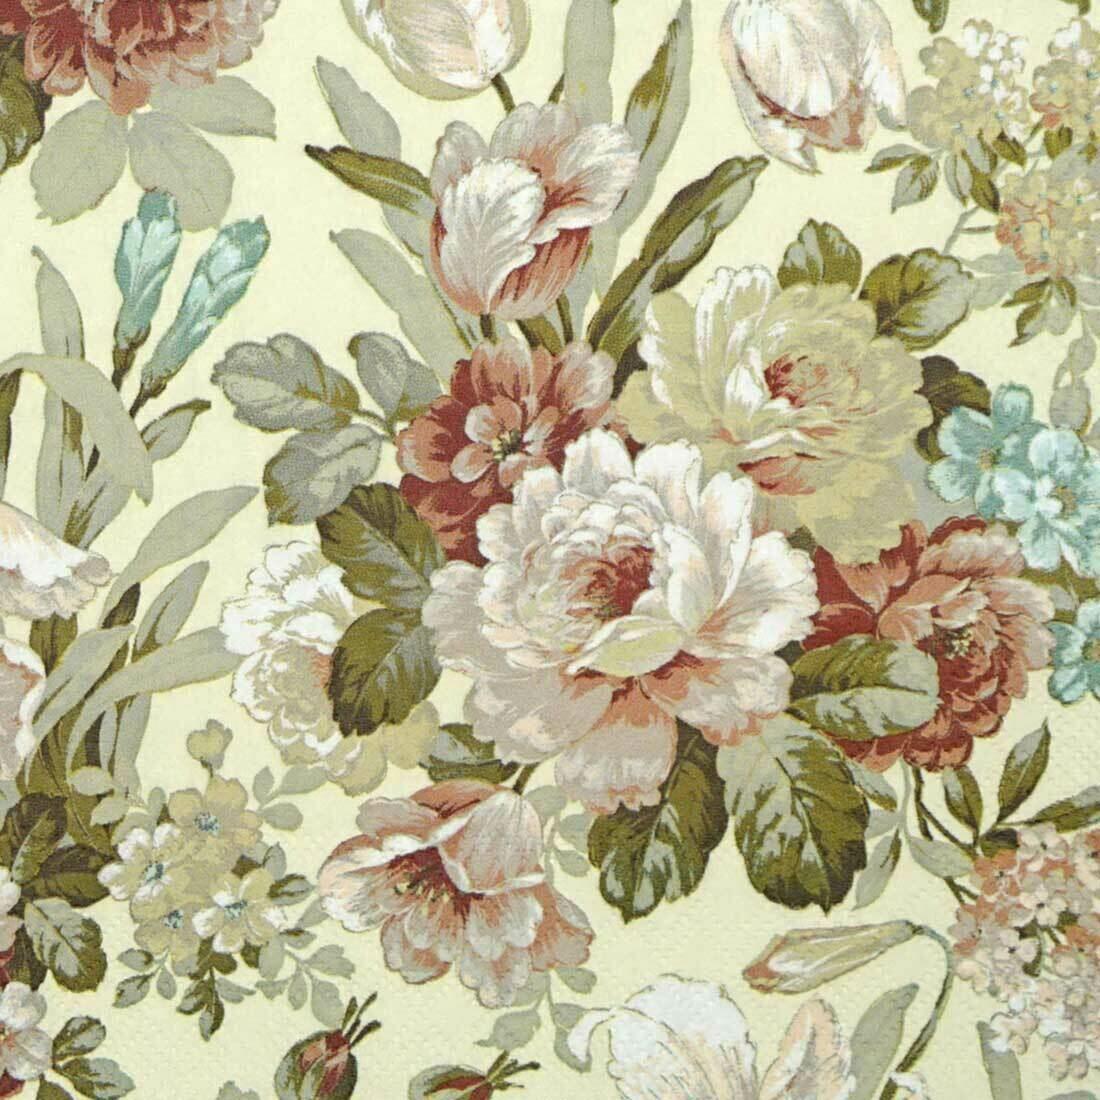 Decoupage Paper Napkins -Floral Cream (1 Sheet)